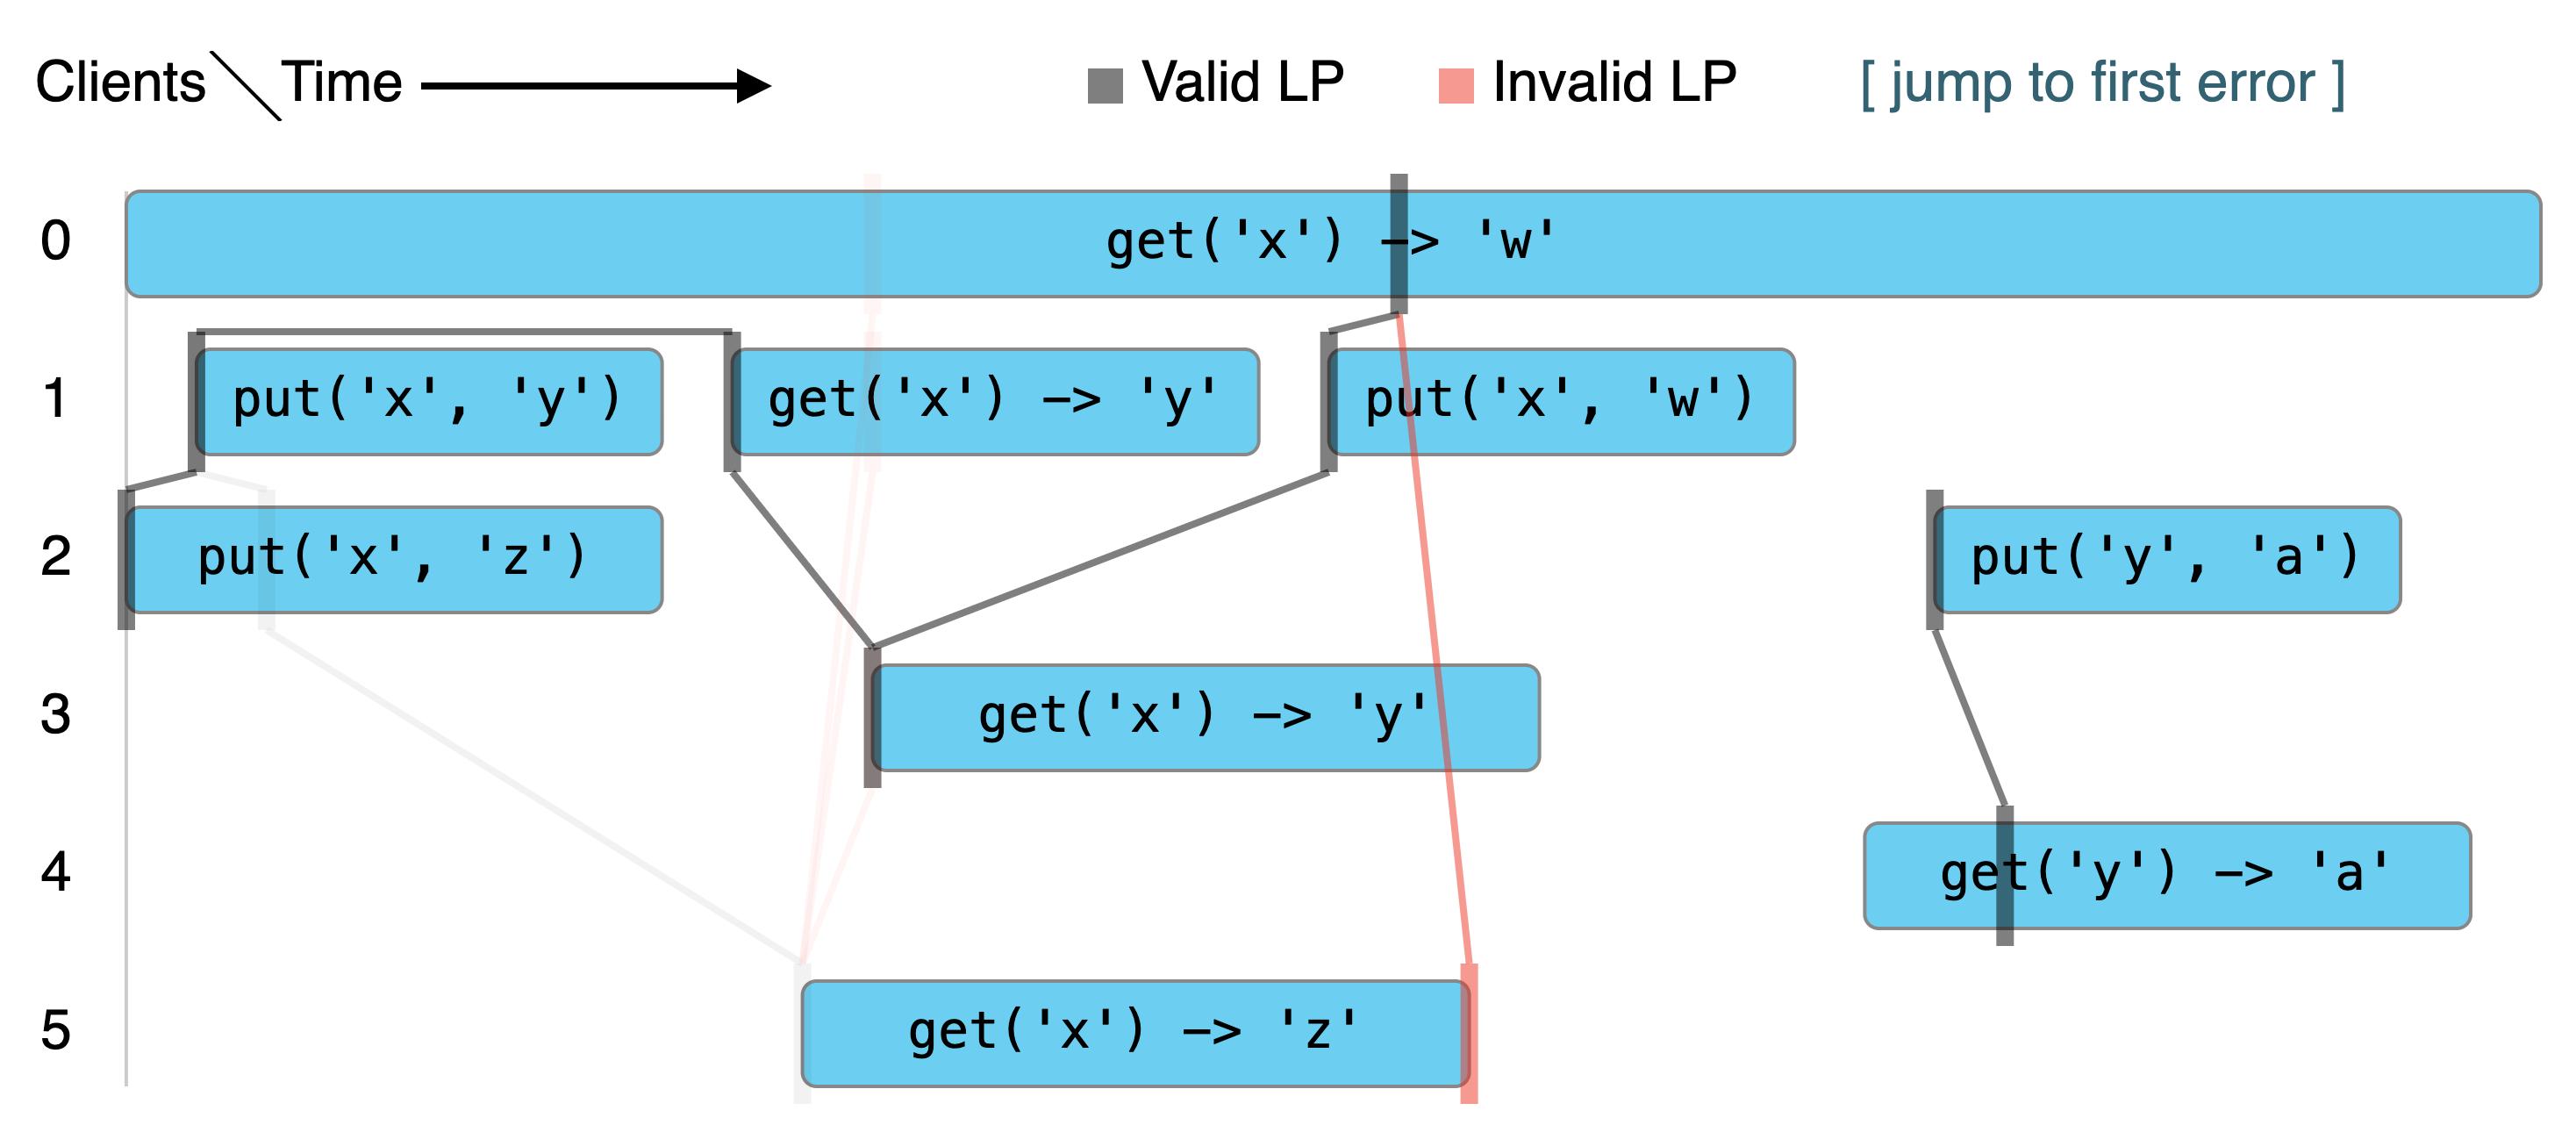 Visualization demo